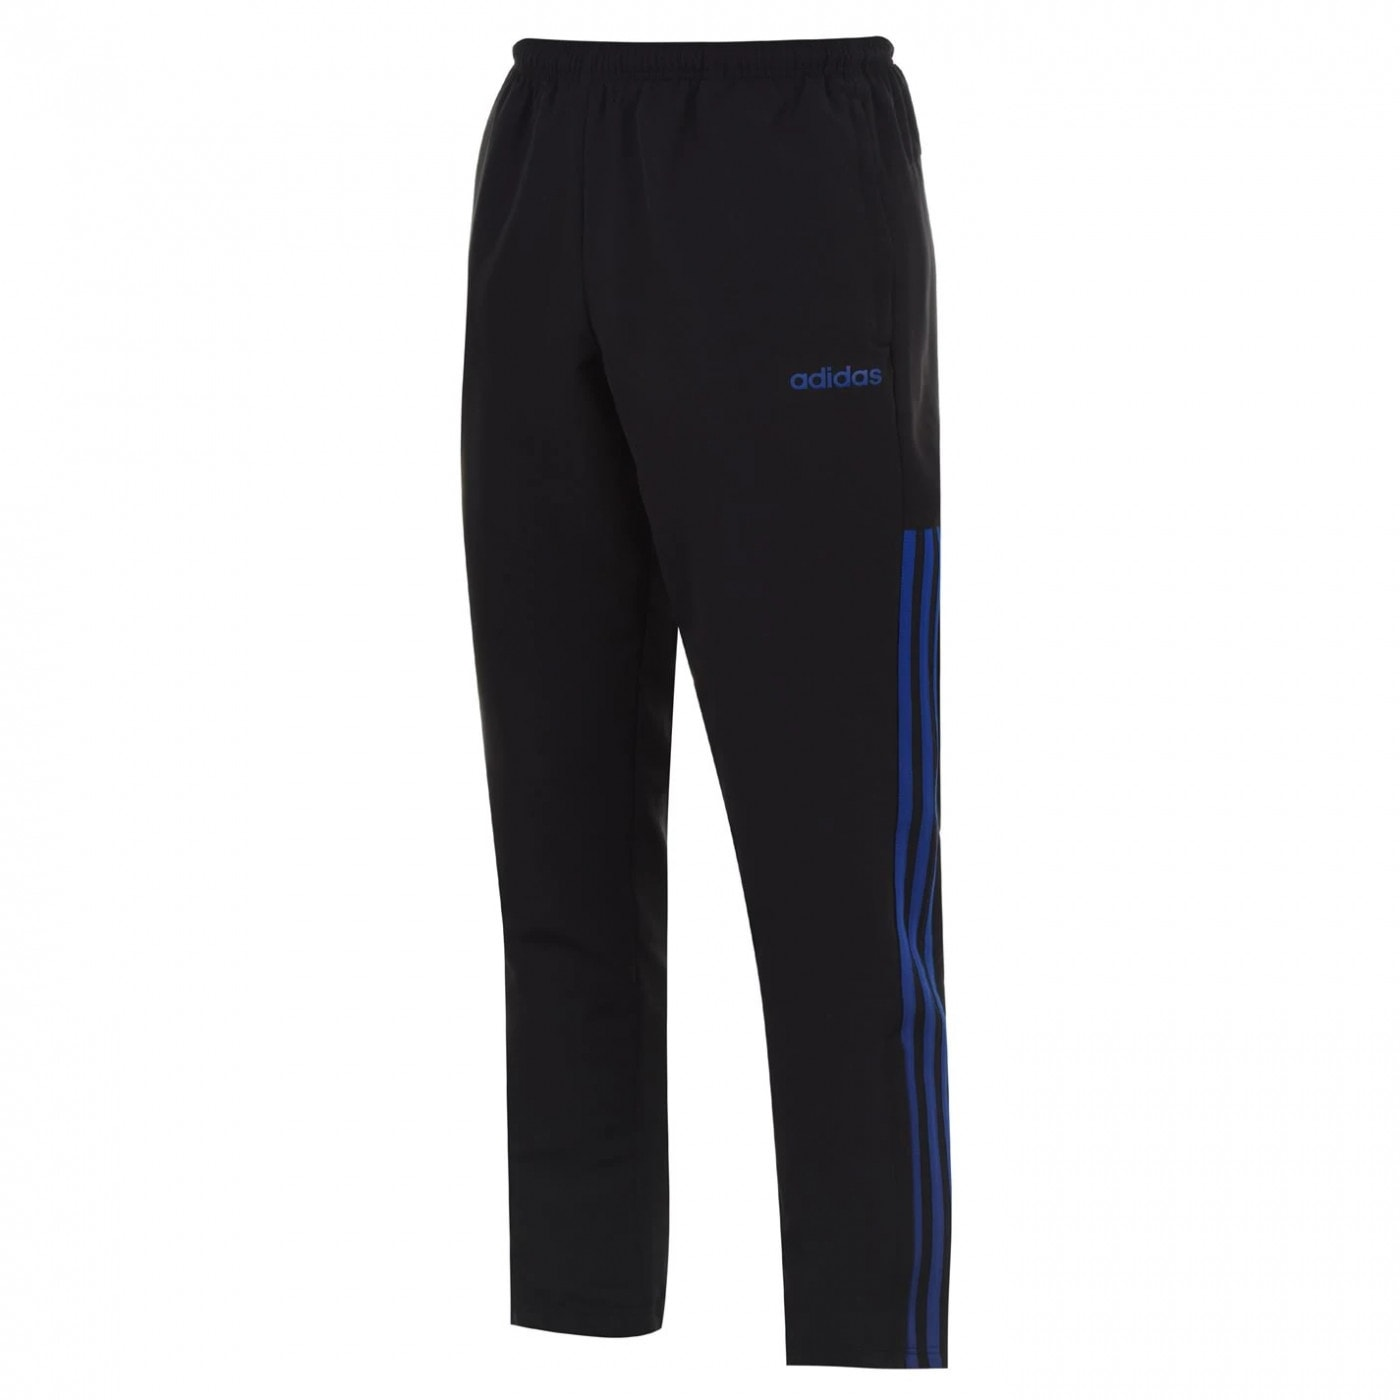 Adidas Samson 2 Tracksuit Bottoms Mens